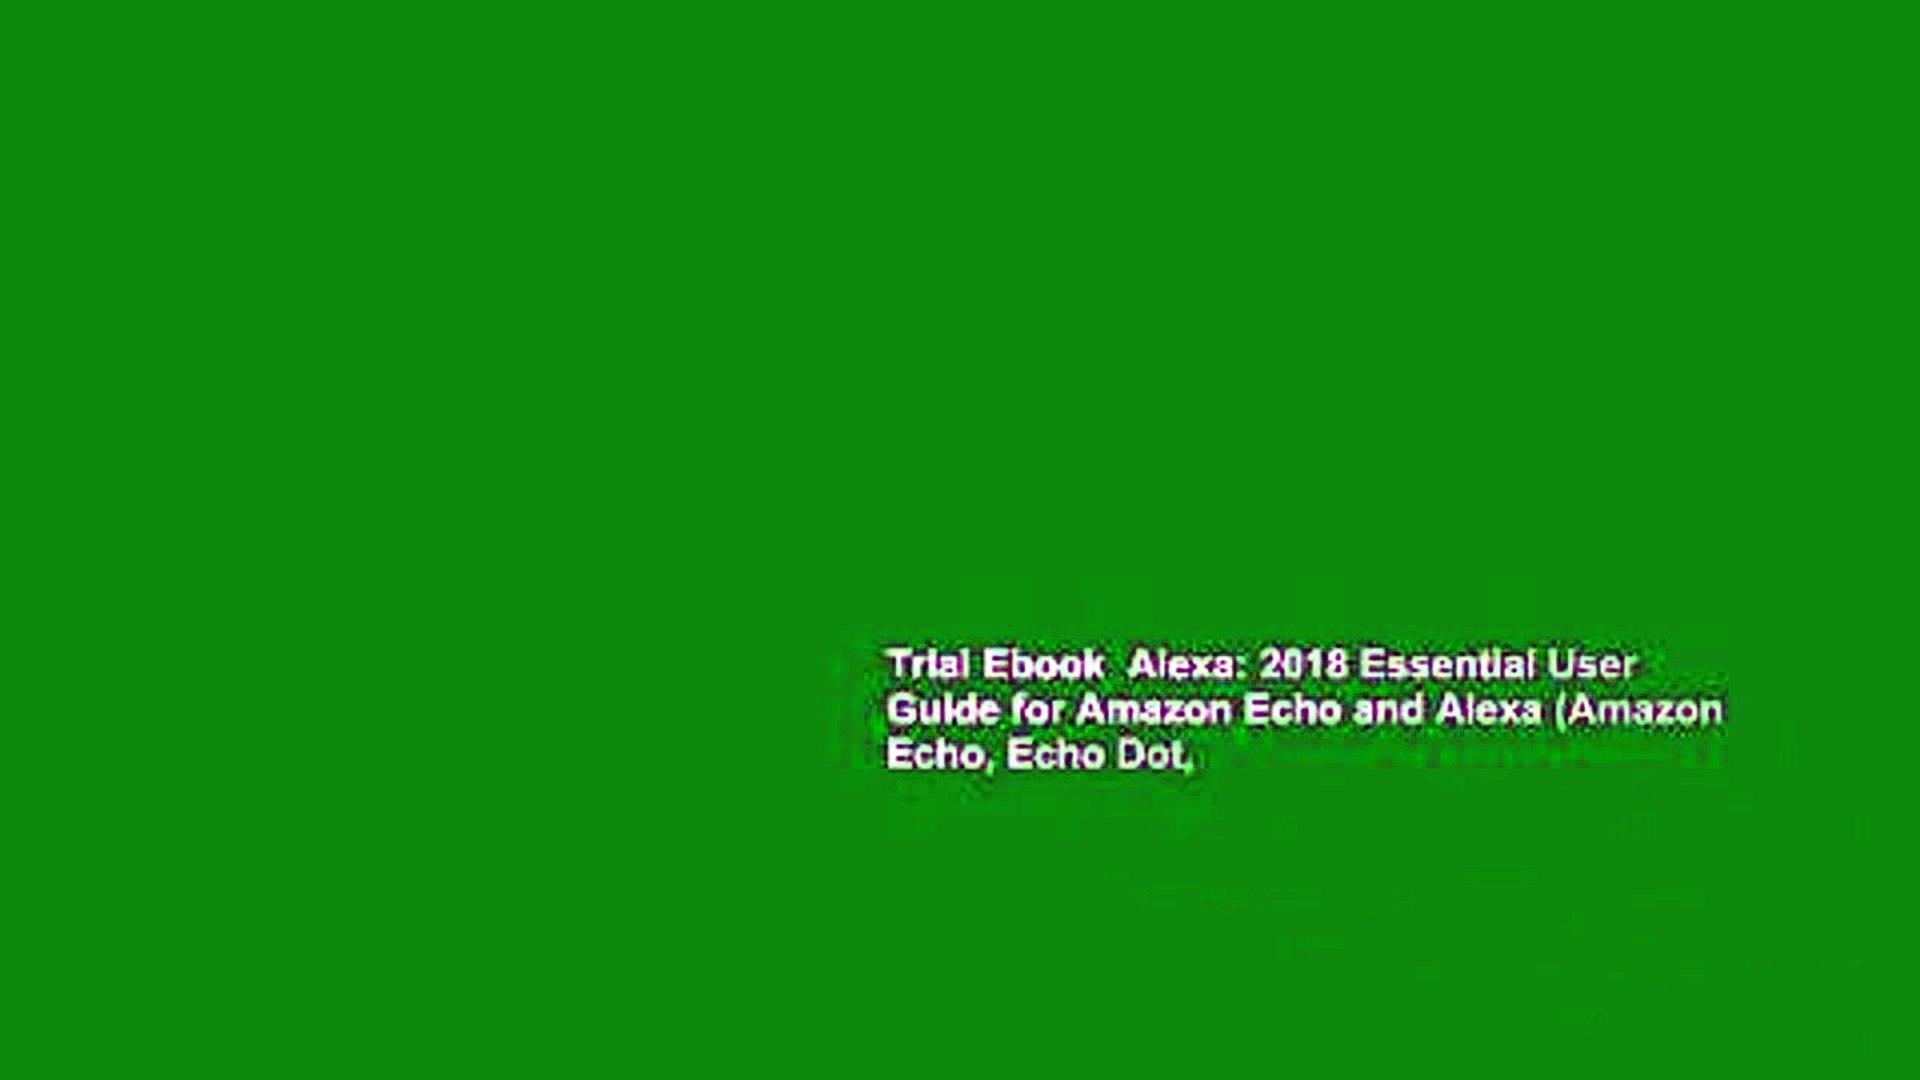 Trial Ebook  Alexa: 2018 Essential User Guide for Amazon Echo and Alexa (Amazon Echo, Echo Dot,